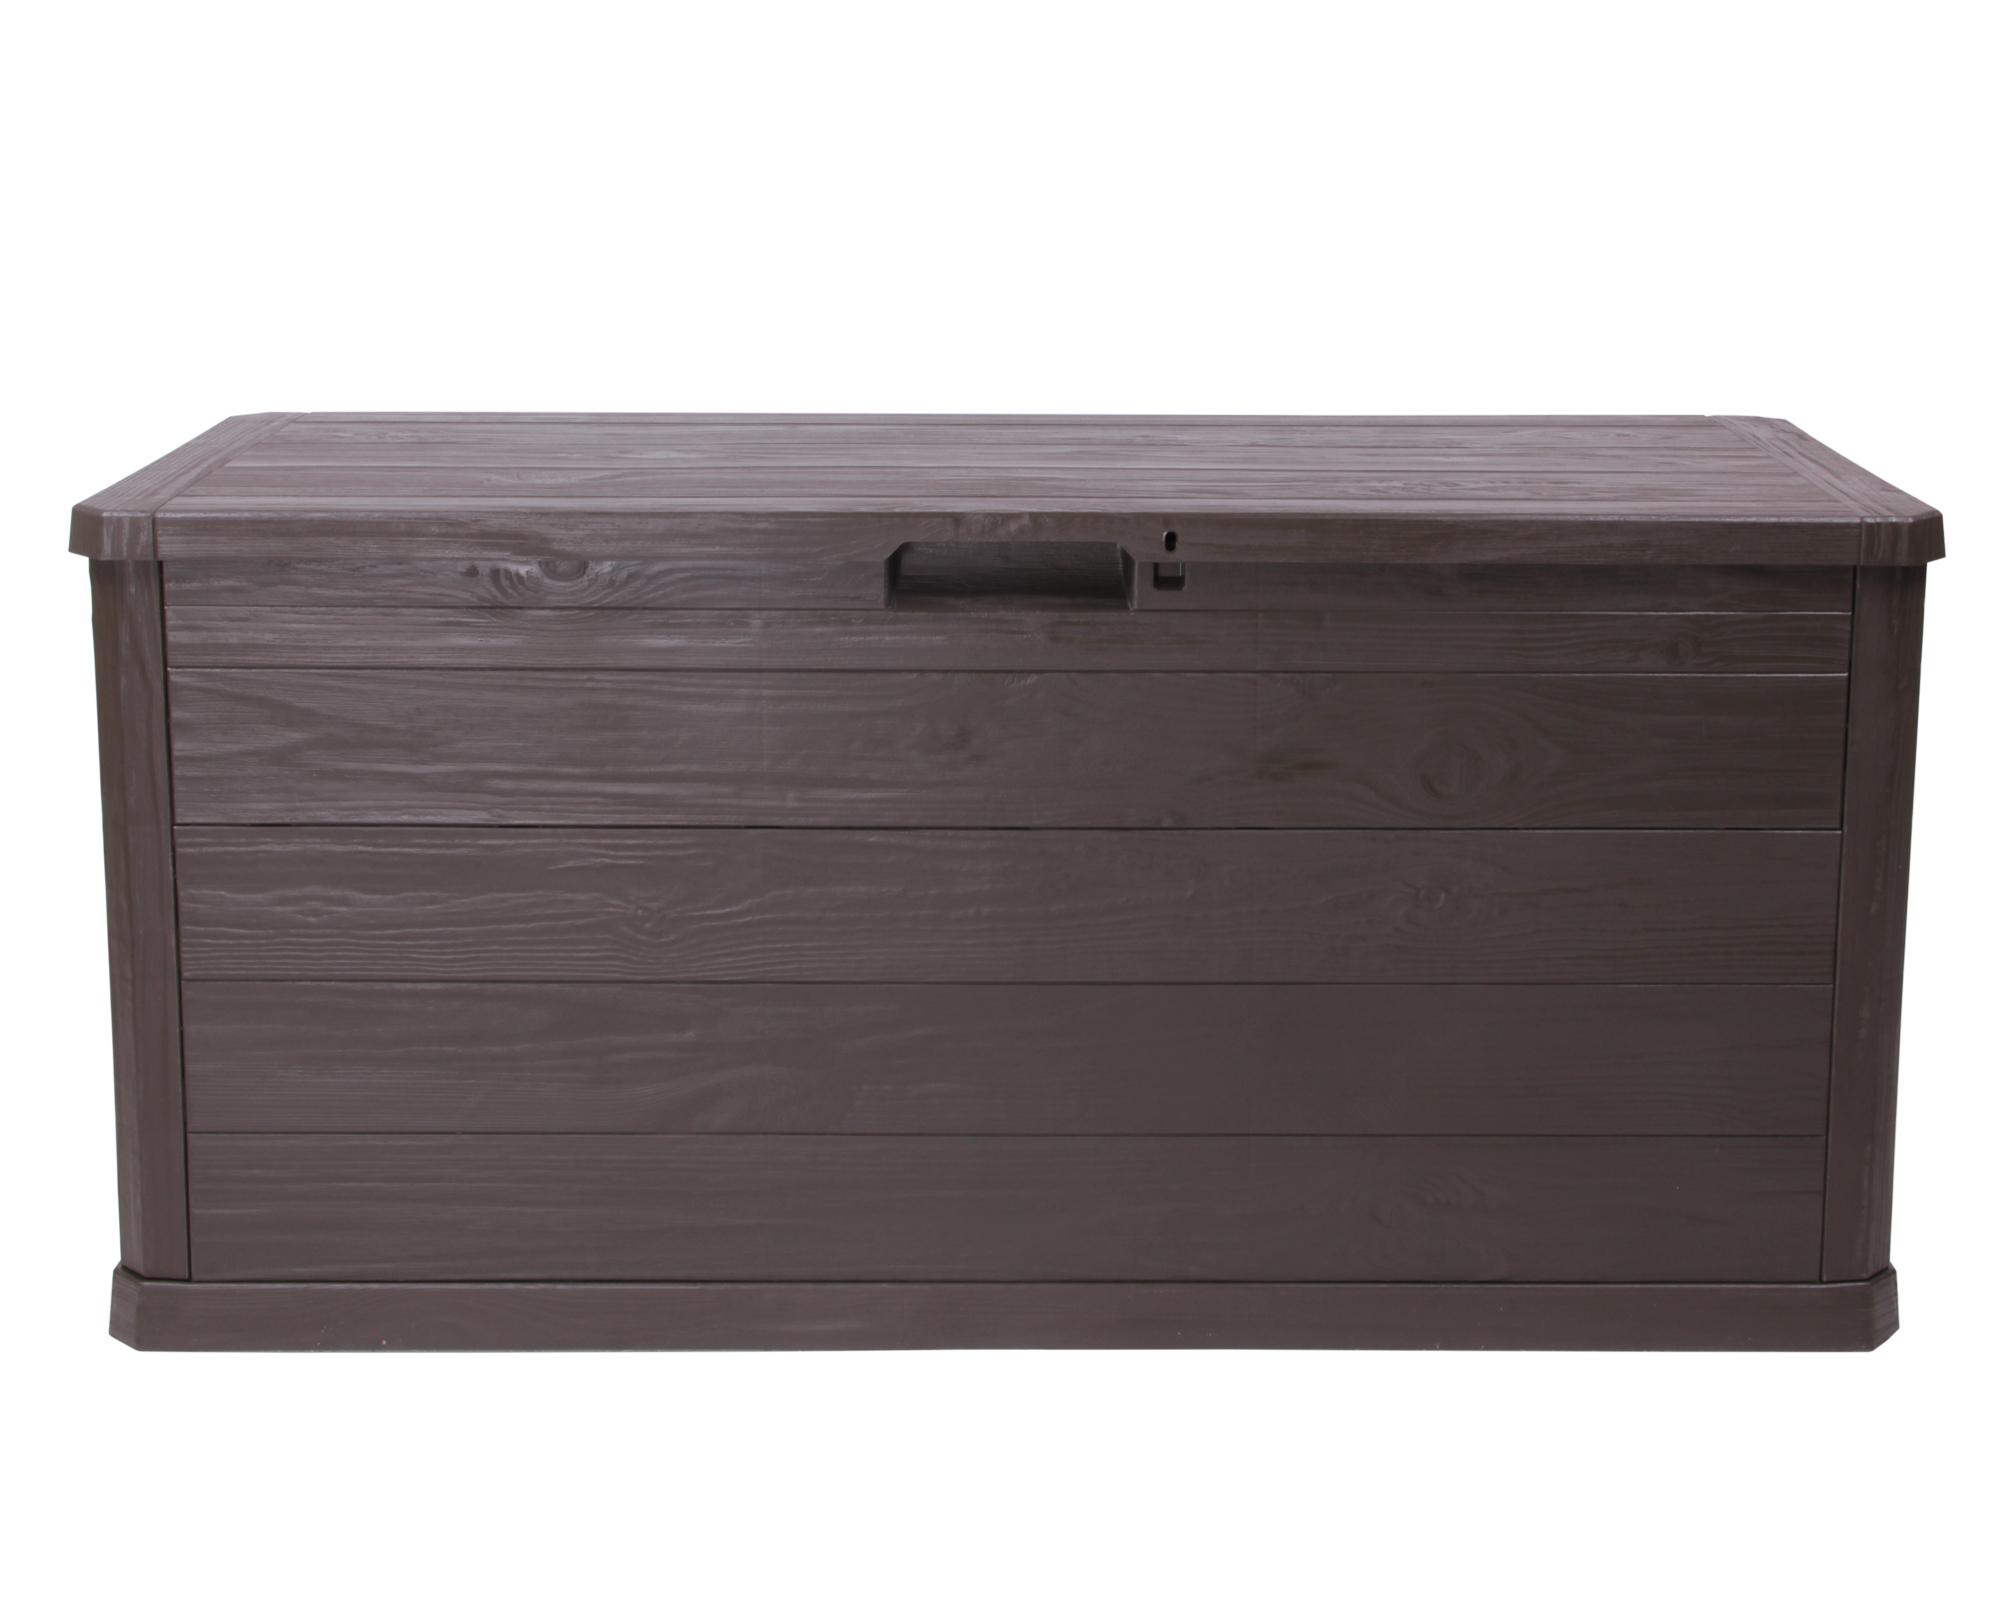 ondis24 kissenbox sitztruhe madera g nstig online kaufen. Black Bedroom Furniture Sets. Home Design Ideas